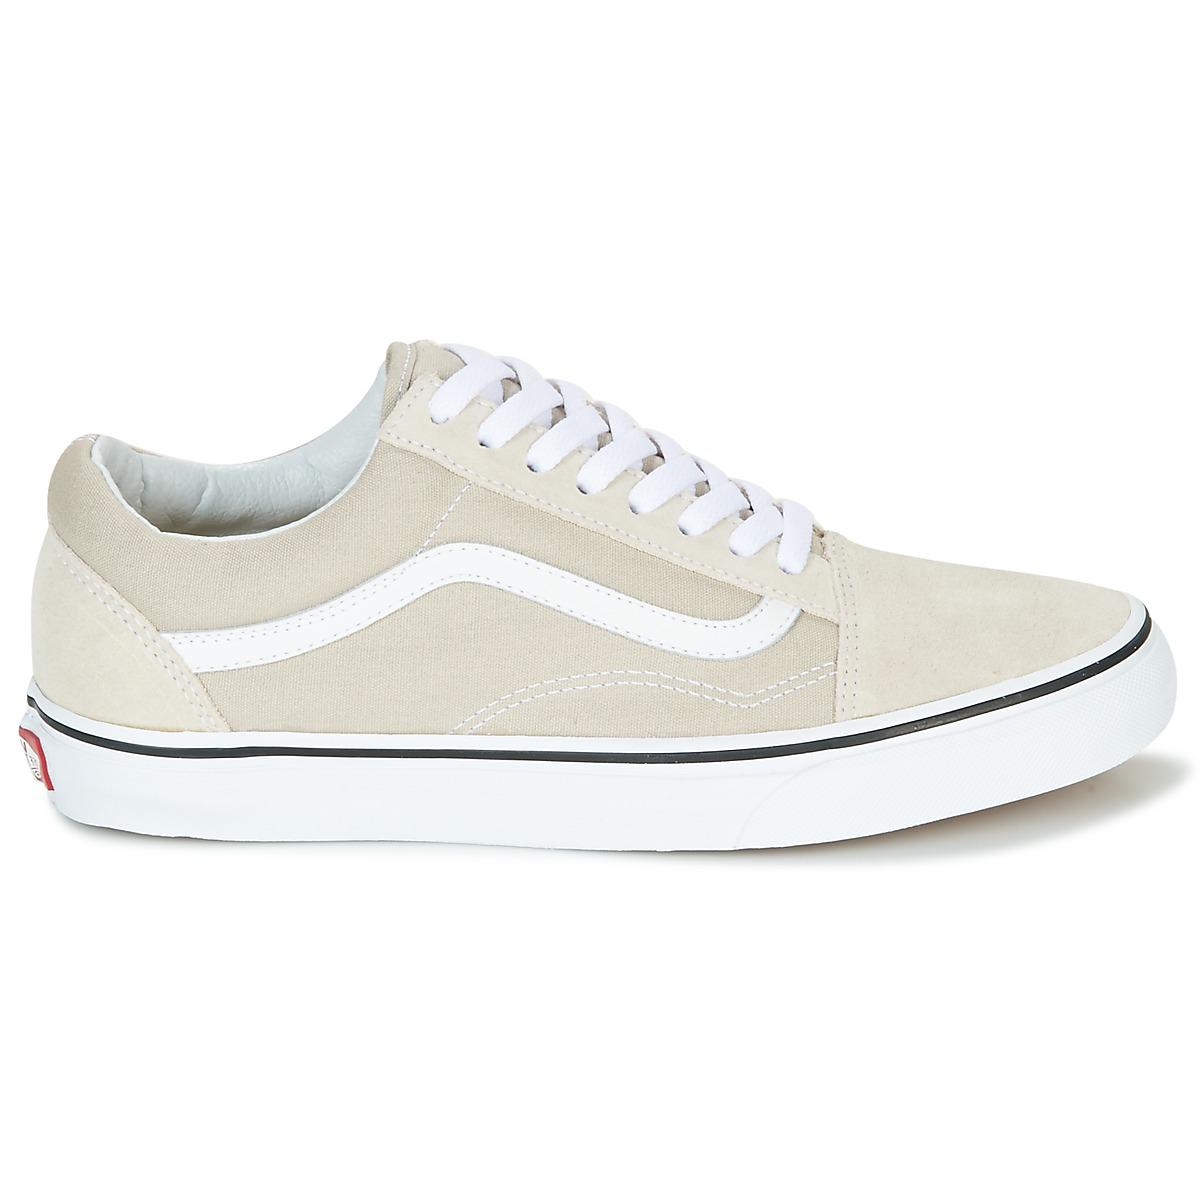 Vans Old Skool Women's Shoes (trainers) In Beige in Natural